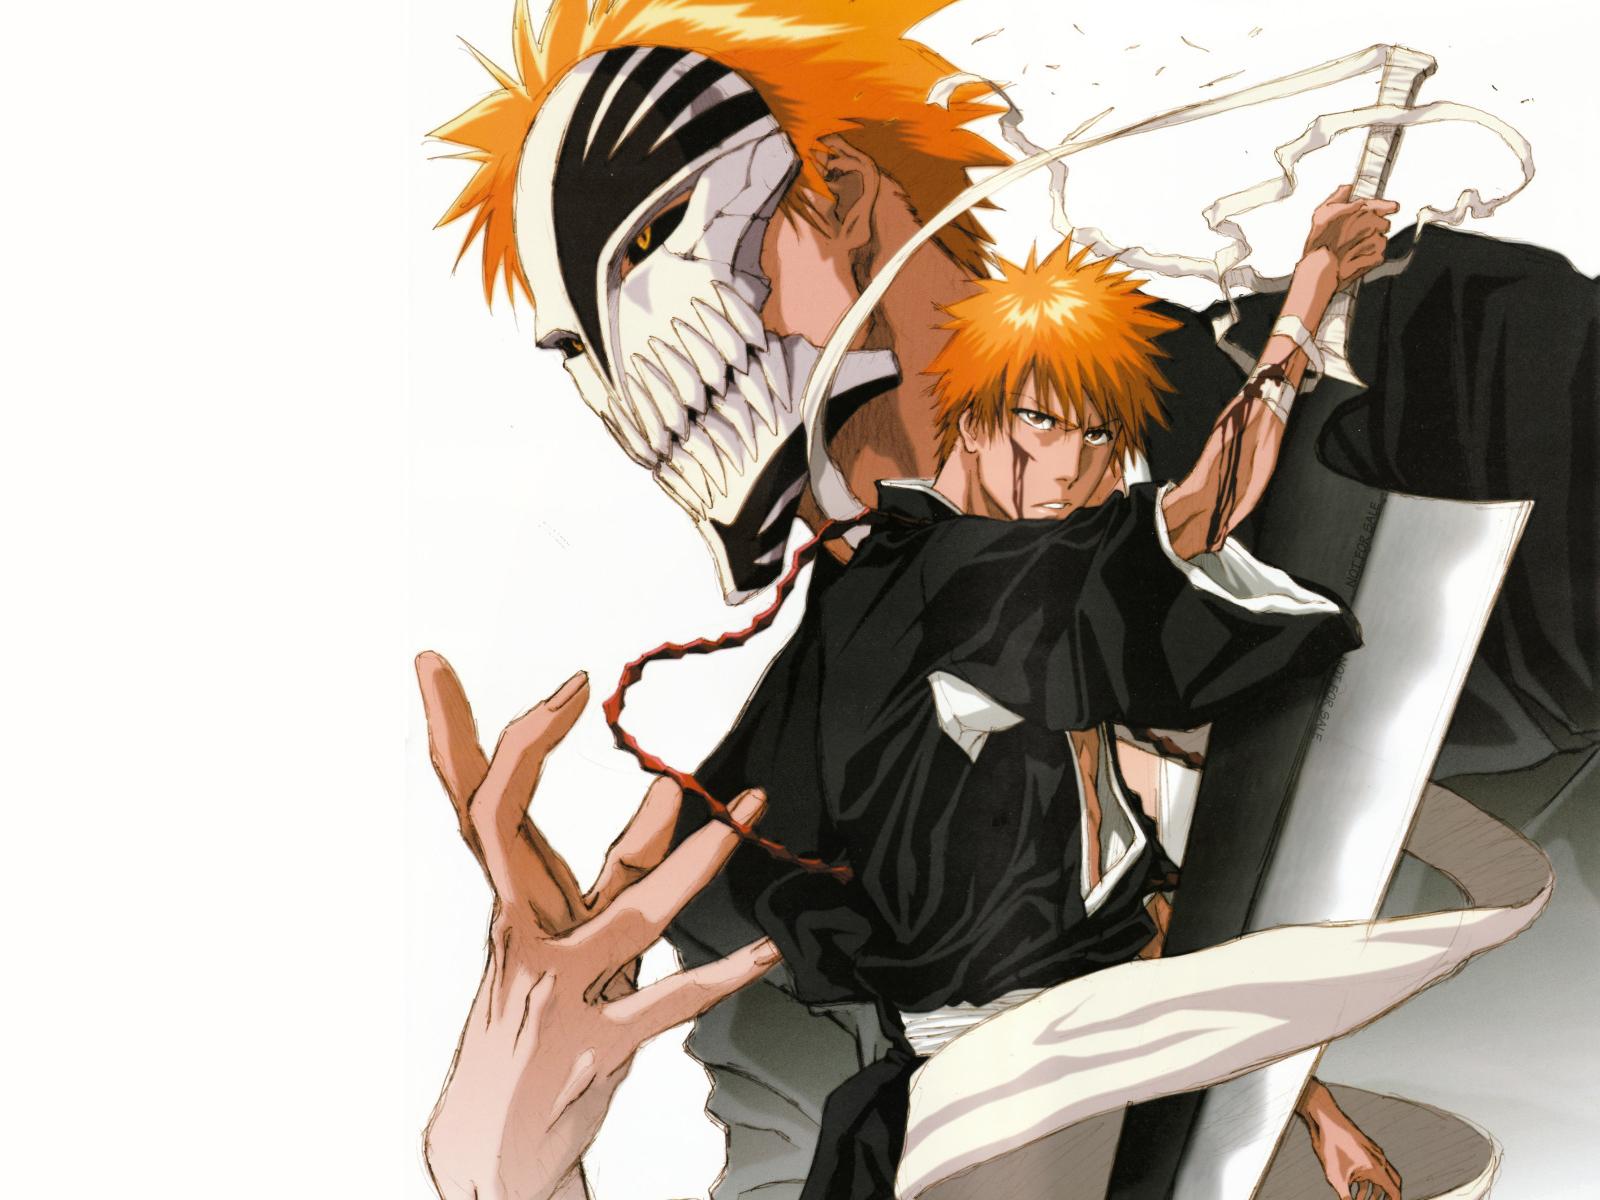 bankai hollow ichigo kurosaki bleach anime wallpaper background 1600x1200